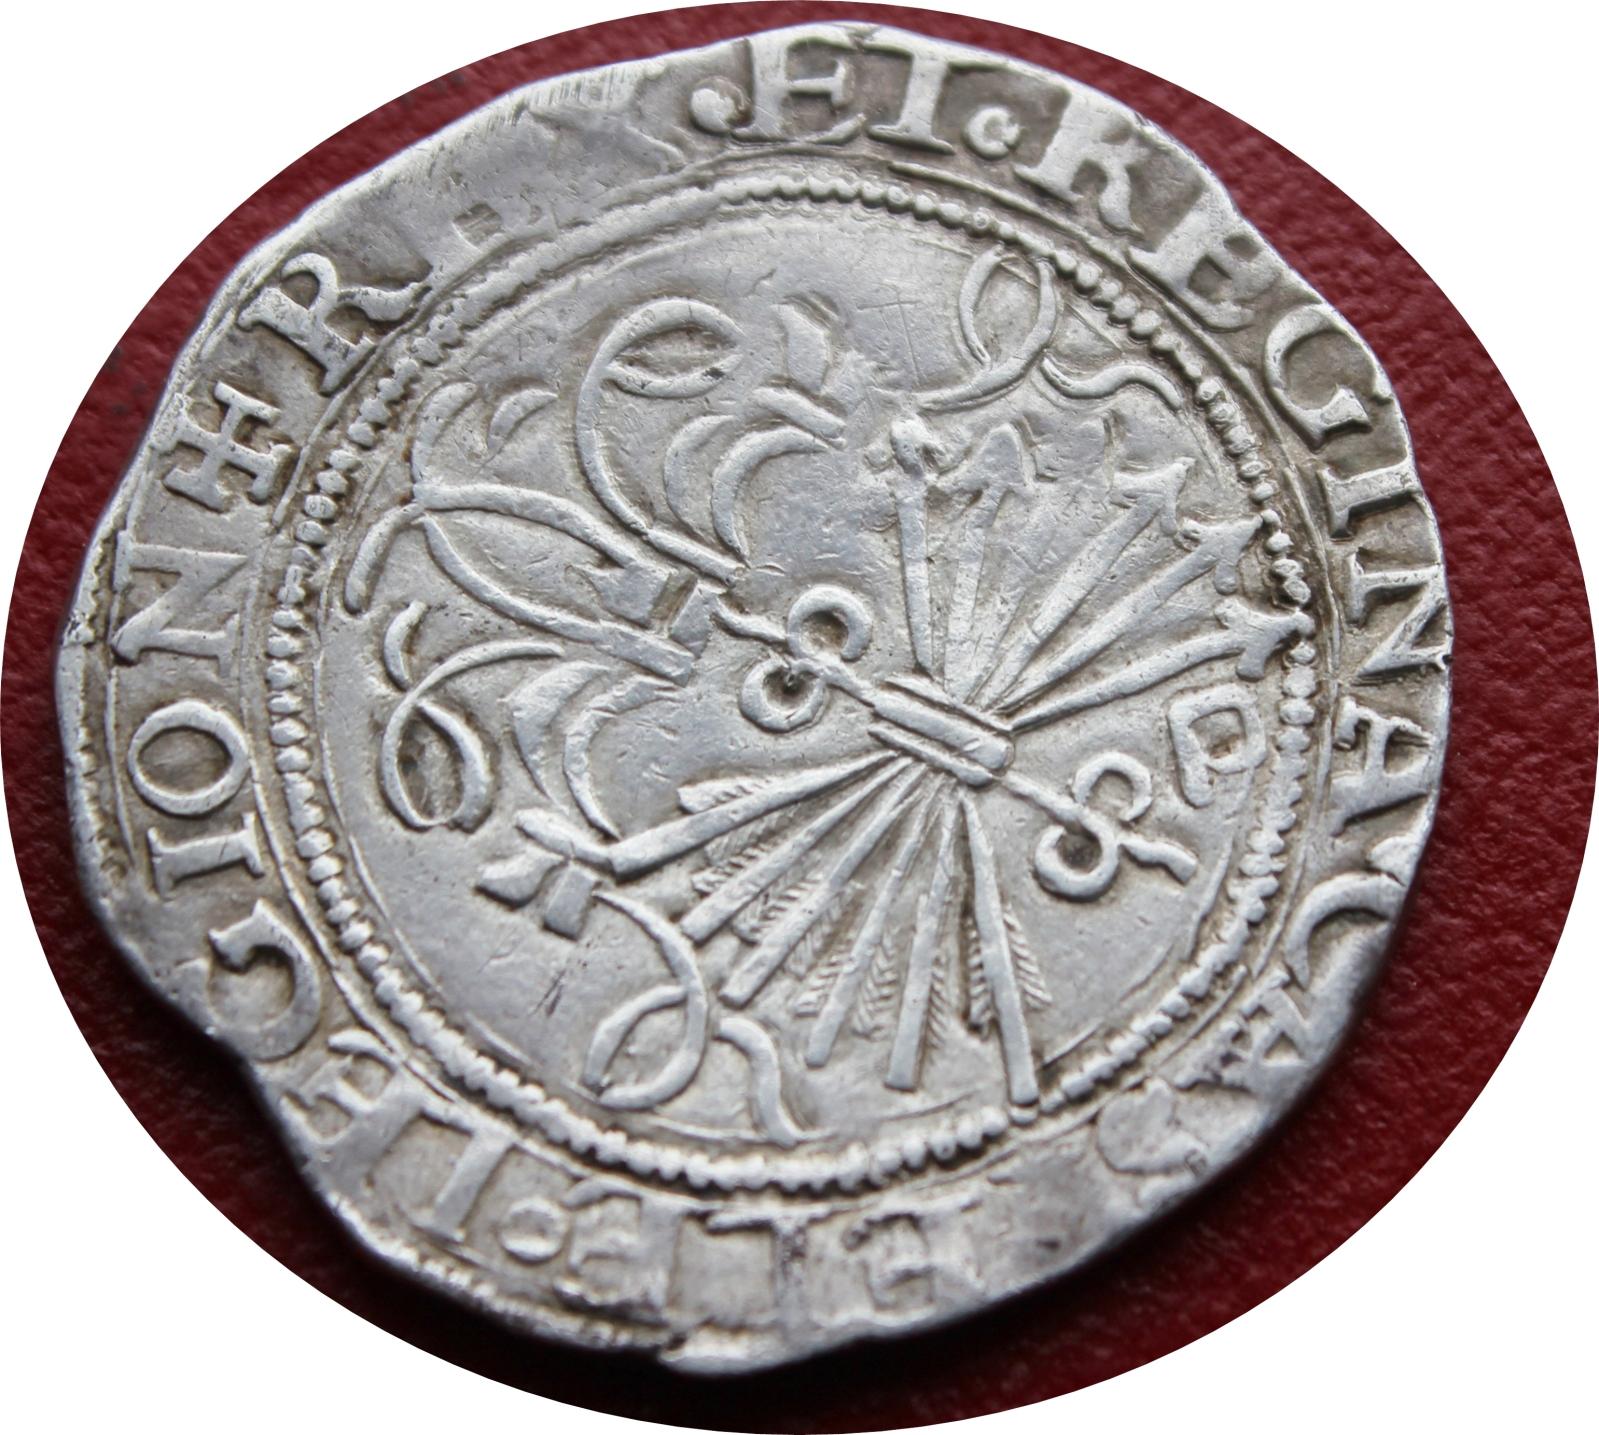 4 Reales a nombre de los Reyes Católicos (1516-1566) Sevilla. 10op2kx